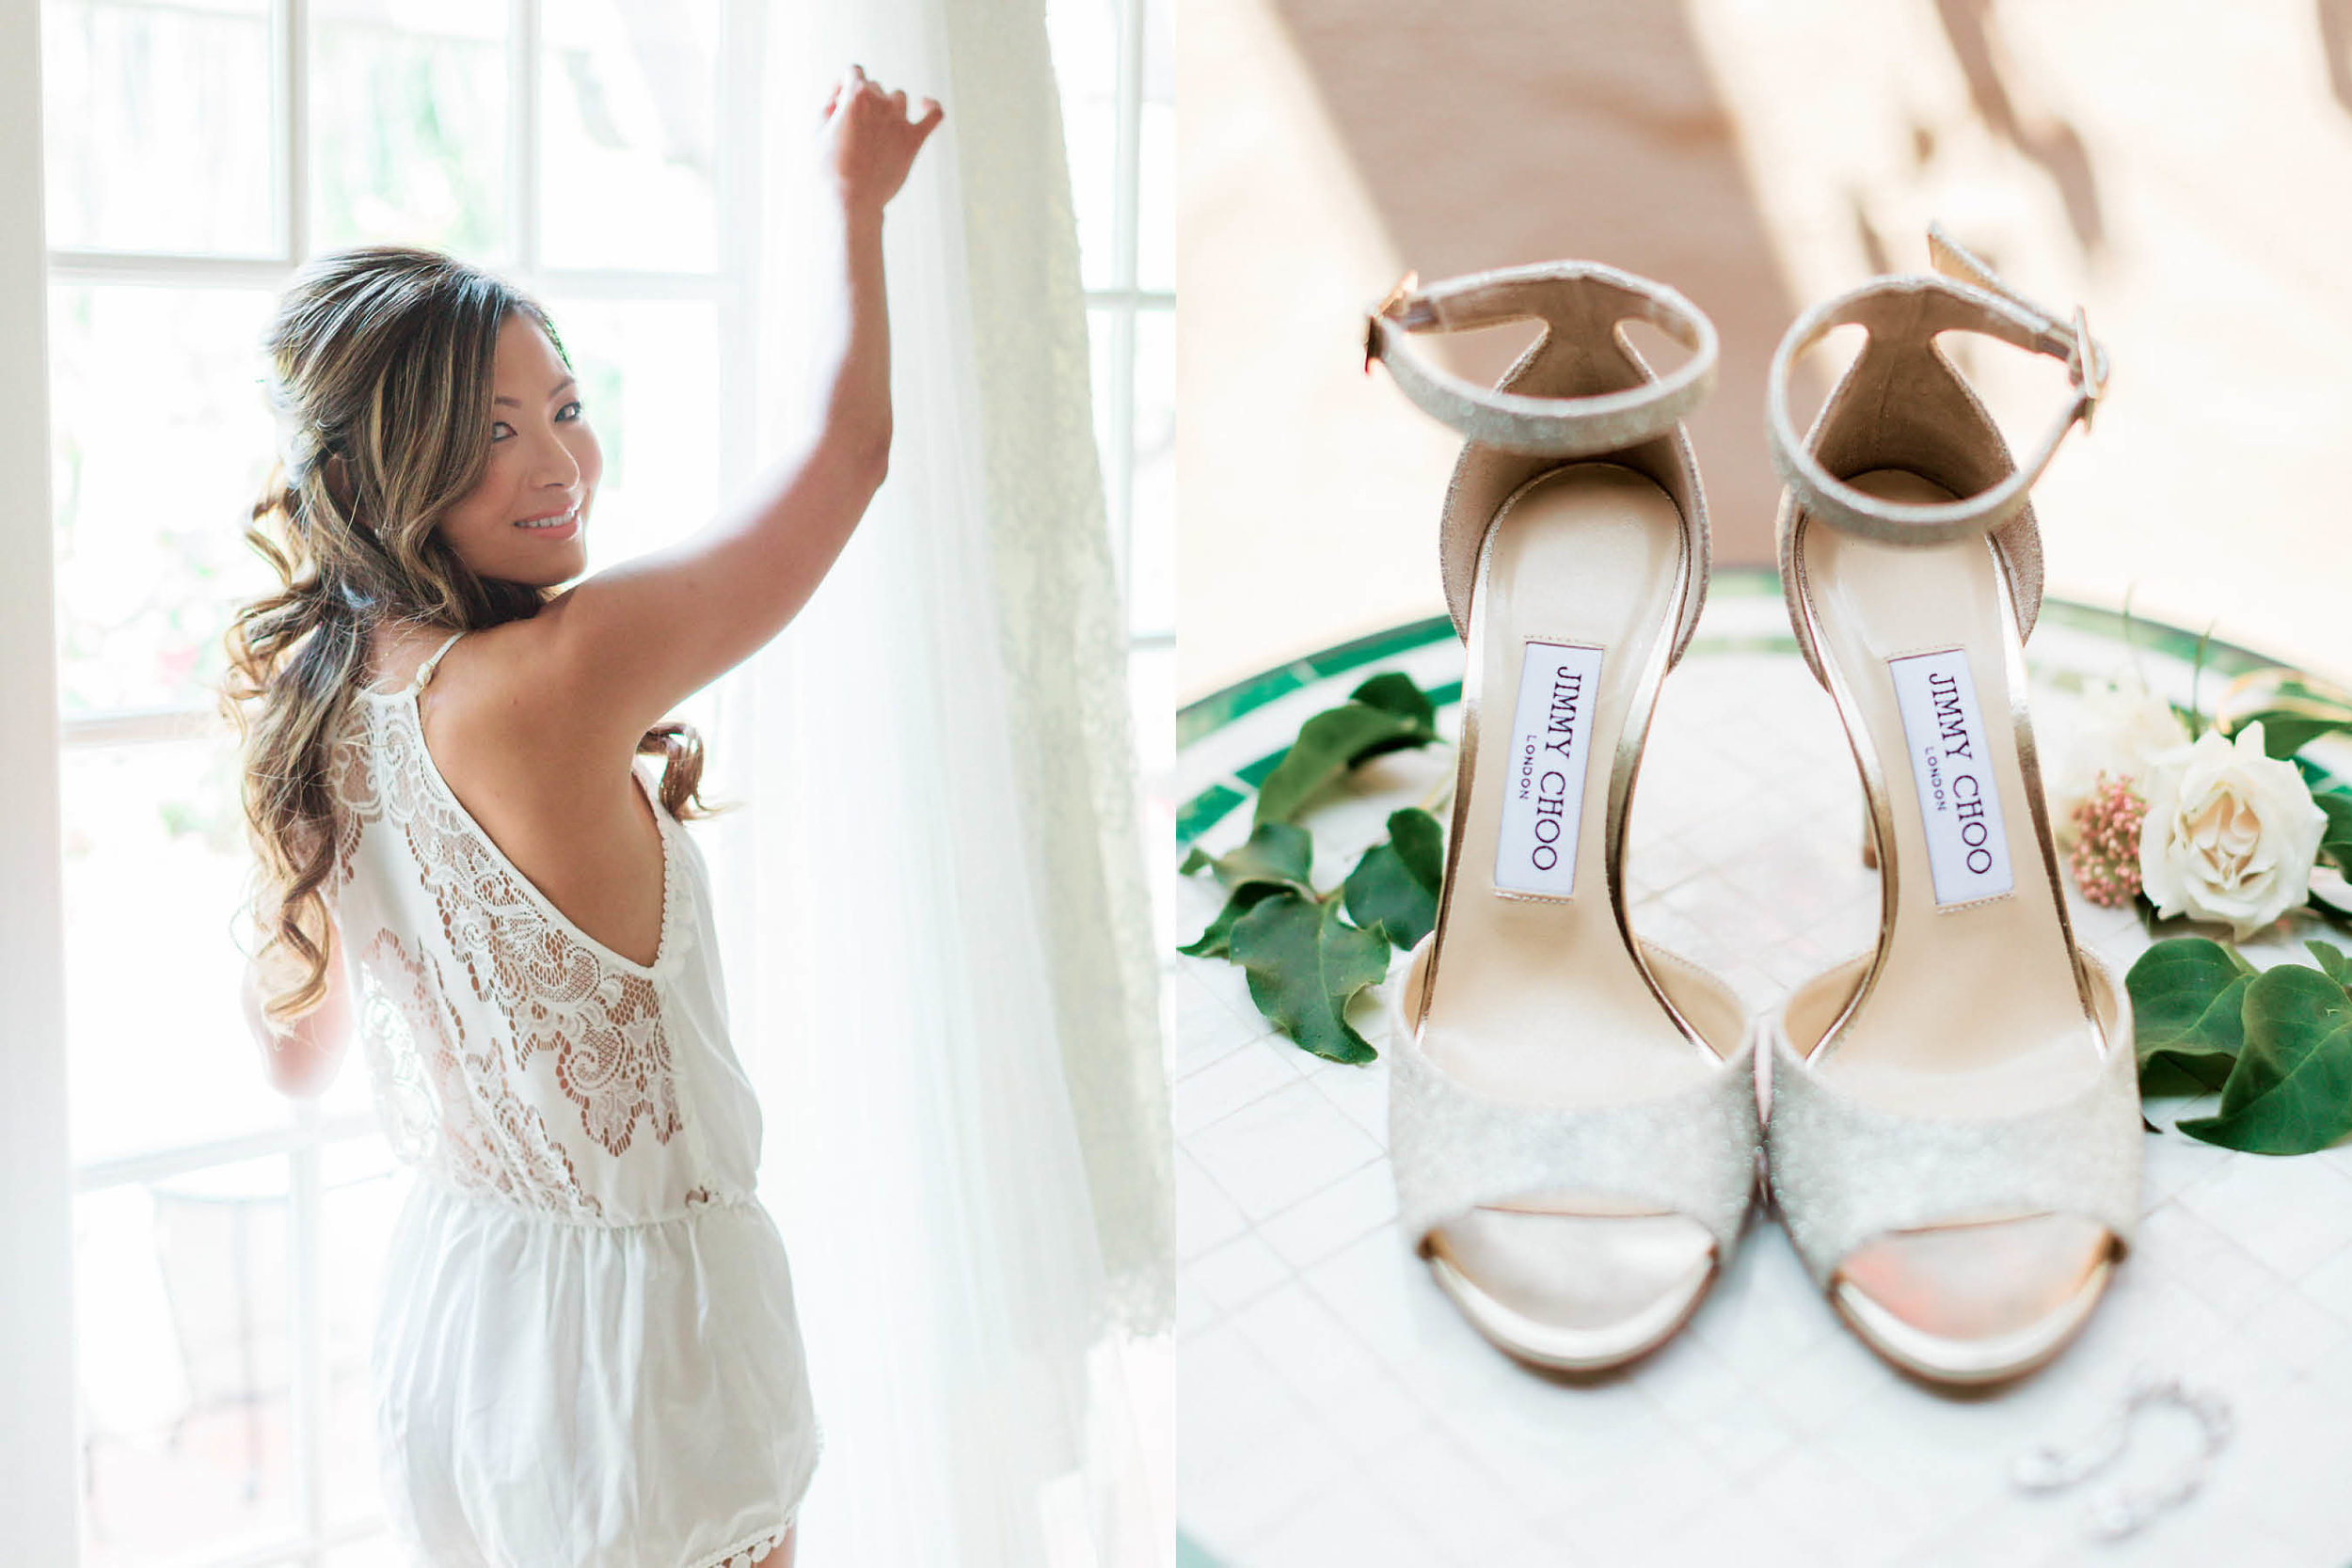 santa-barbara-elopement-elope-wedding-planner-coordinator-day-of-four-seasons-biltmore-ocean-front-view-garden-pink-white-green-montecito-black-tie (4).jpg